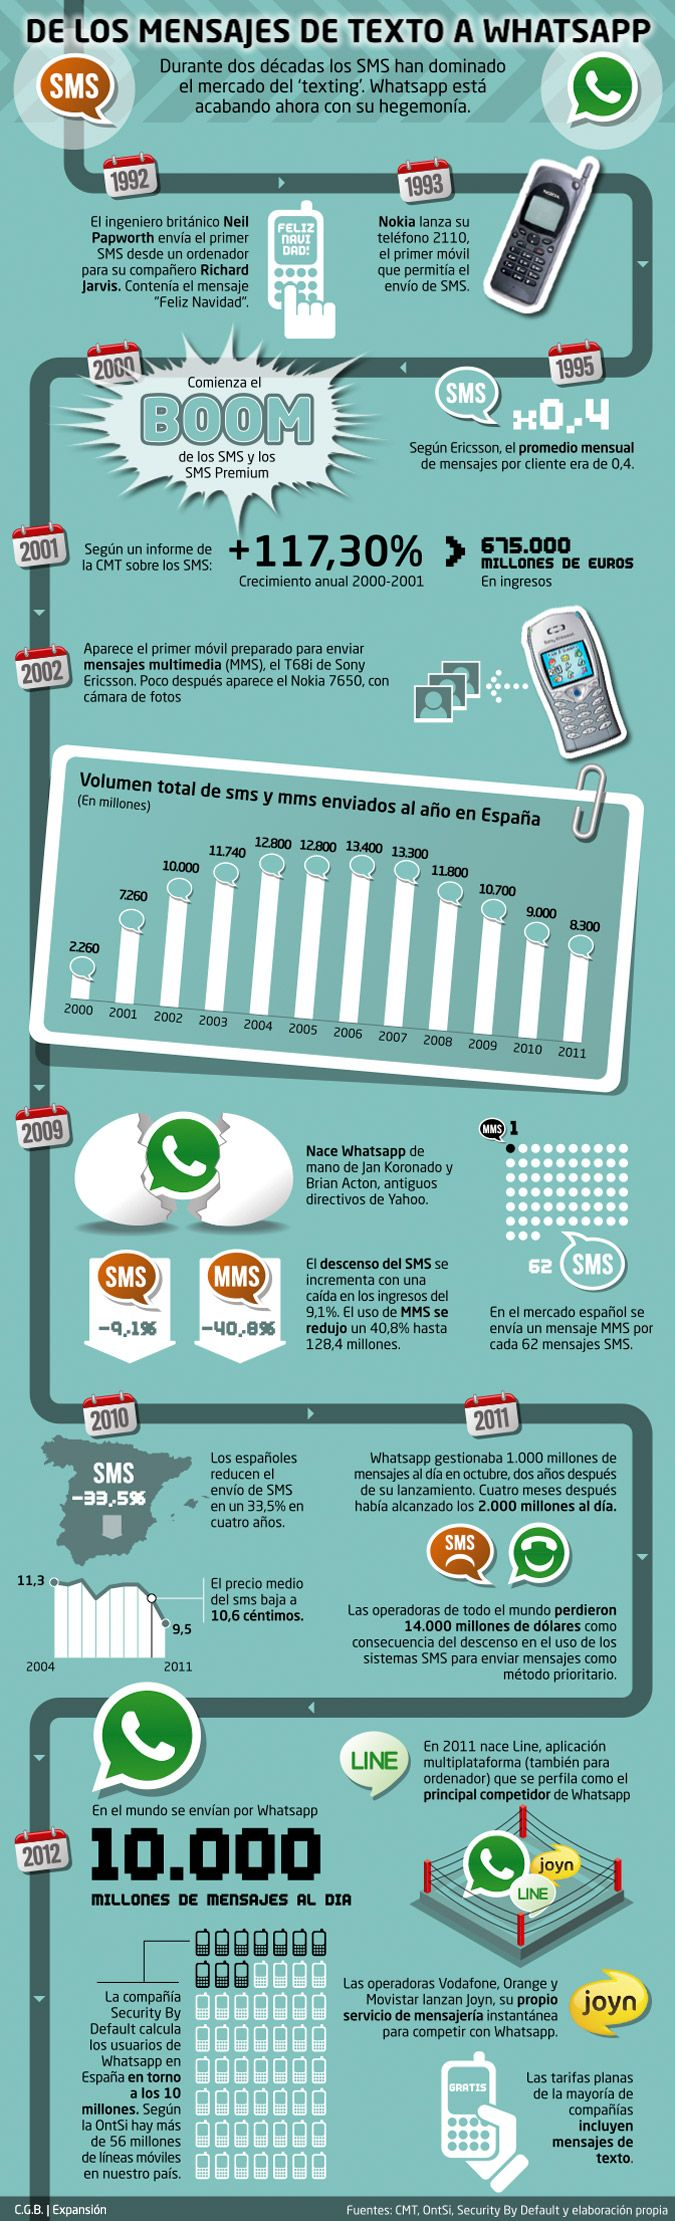 De los mensajes de texto a Whatsapp #infografia #infographic #internet